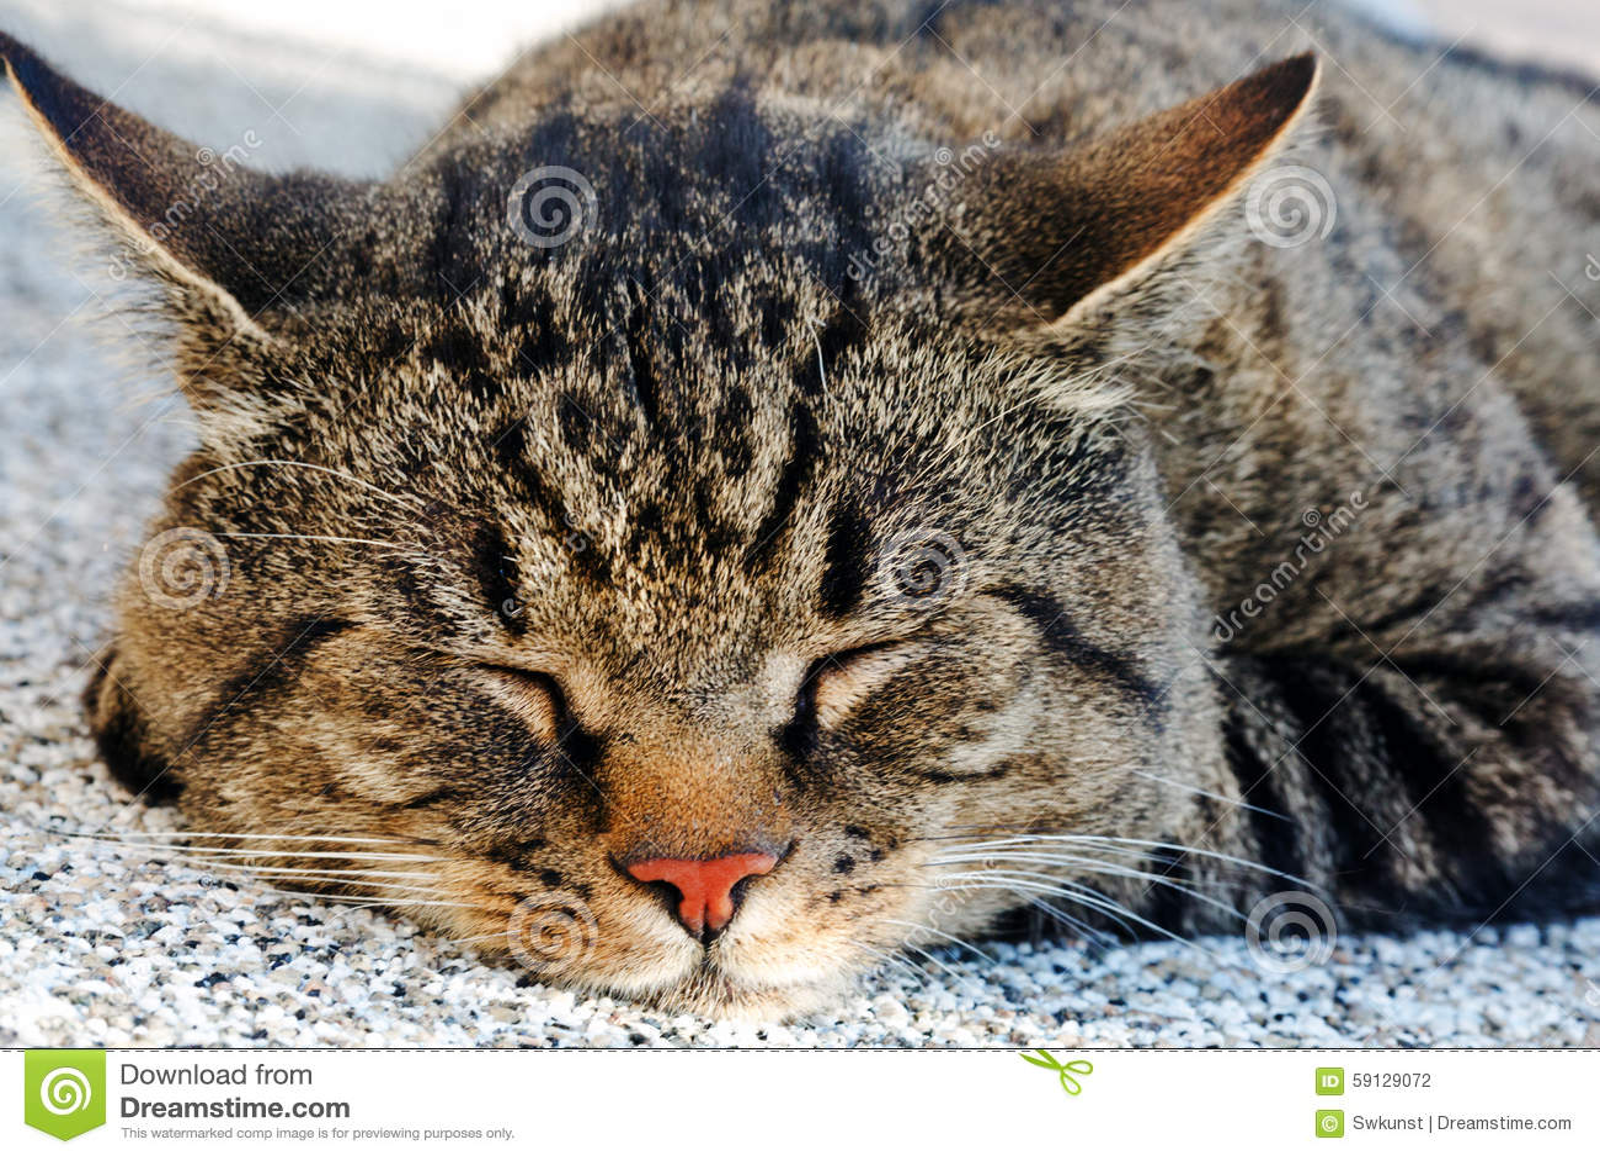 sleeping closeup